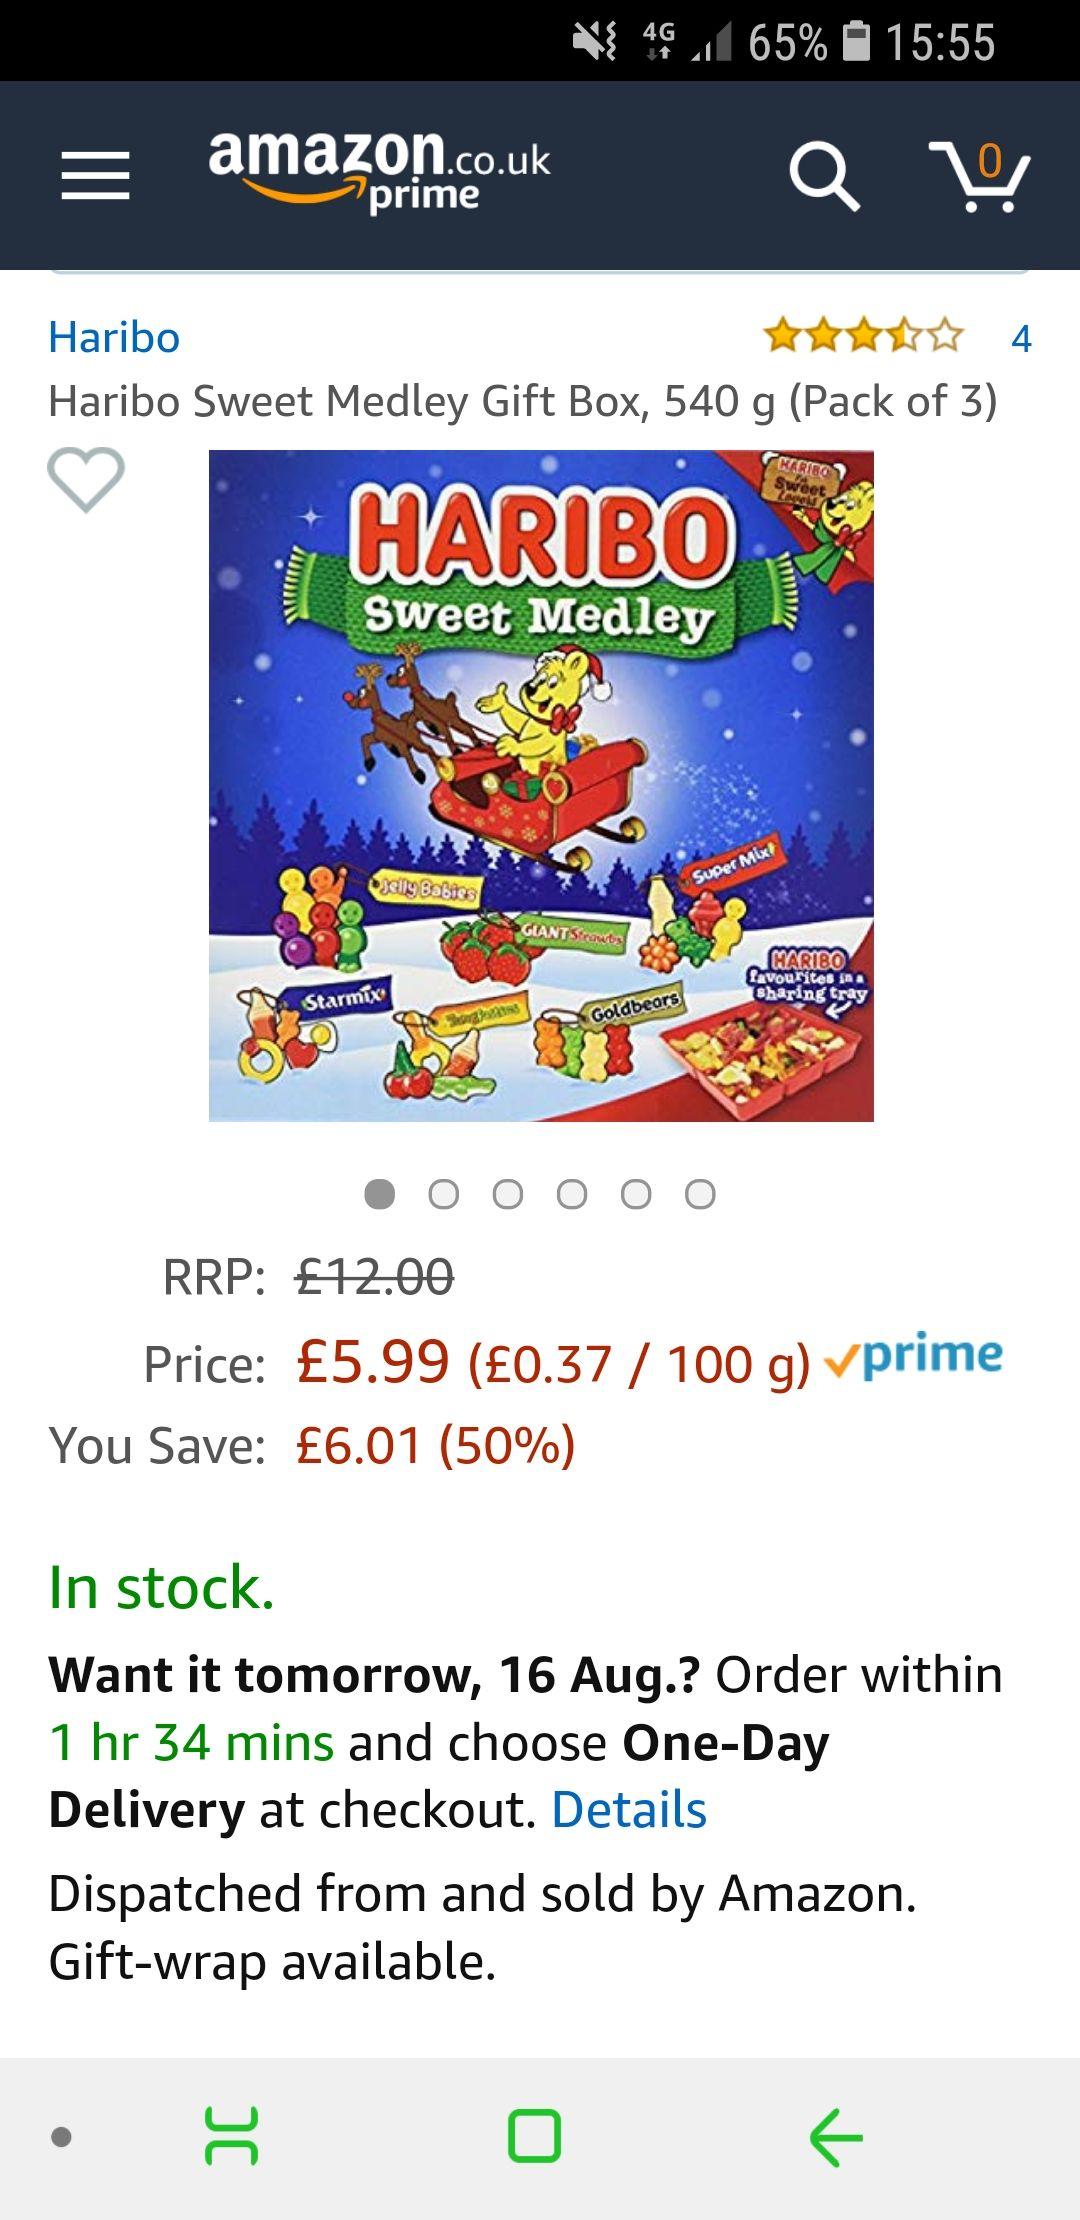 Haribo Sweet Medley Gift Box, 540 g (Pack of 3) £5.00 prime / £10.48 non prime @ Amazon